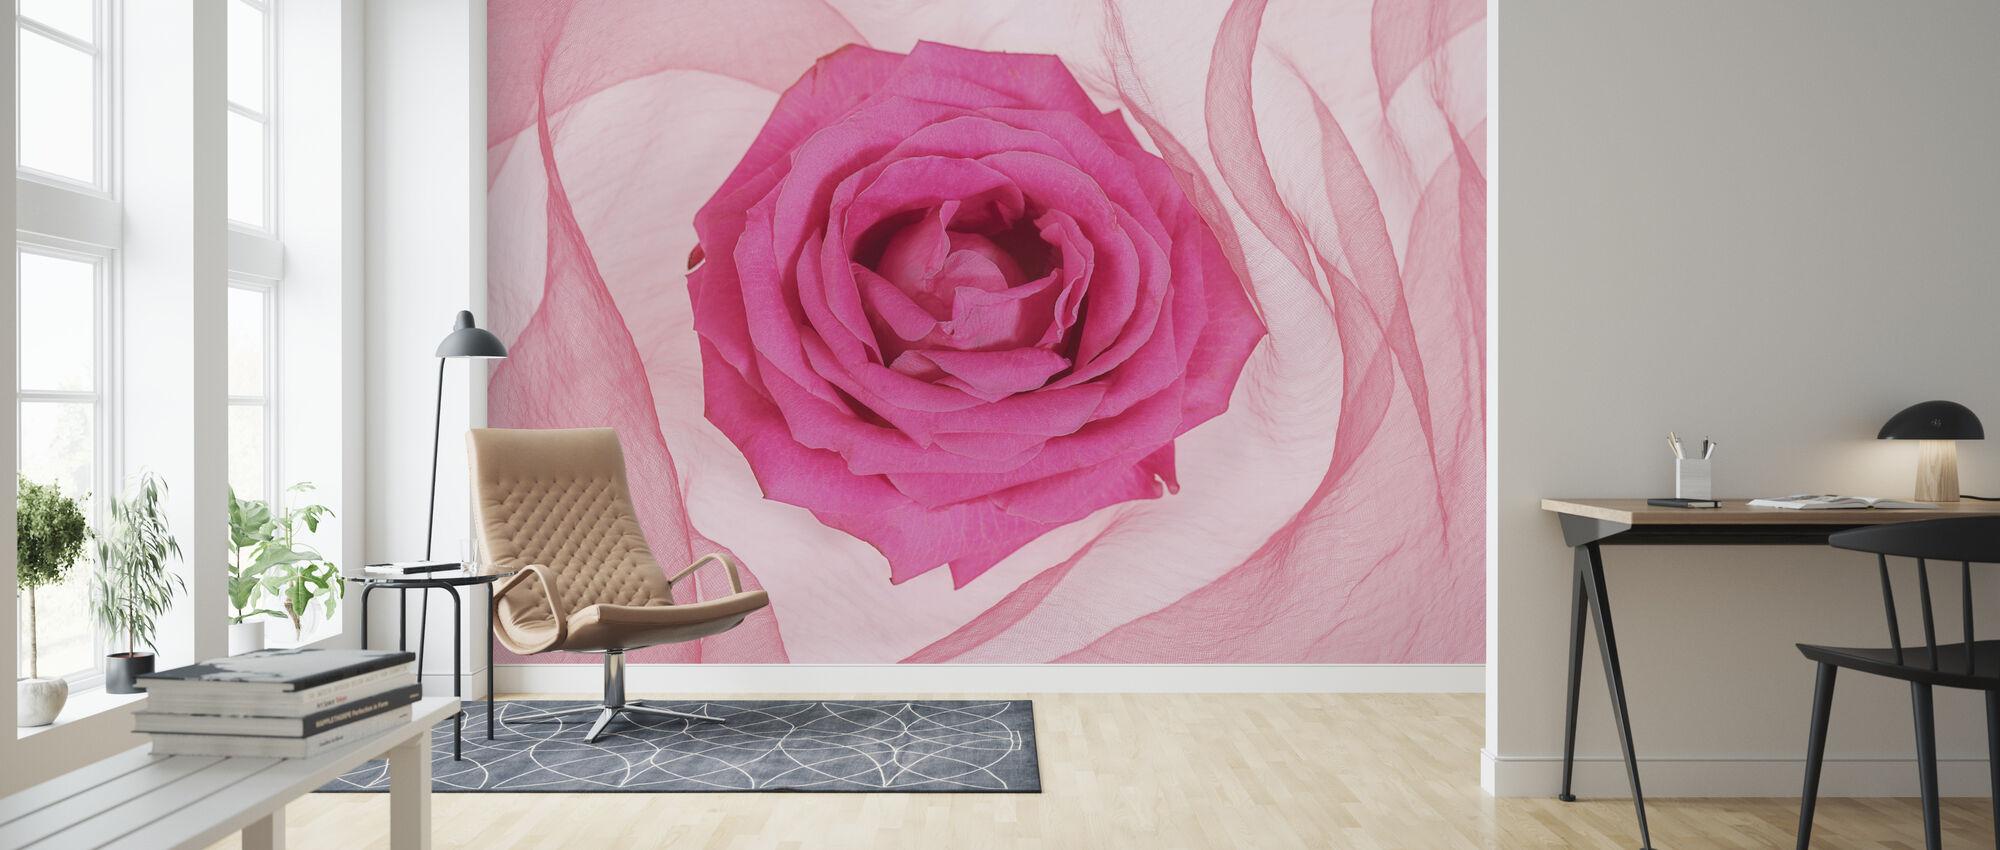 Romantic - Wallpaper - Living Room